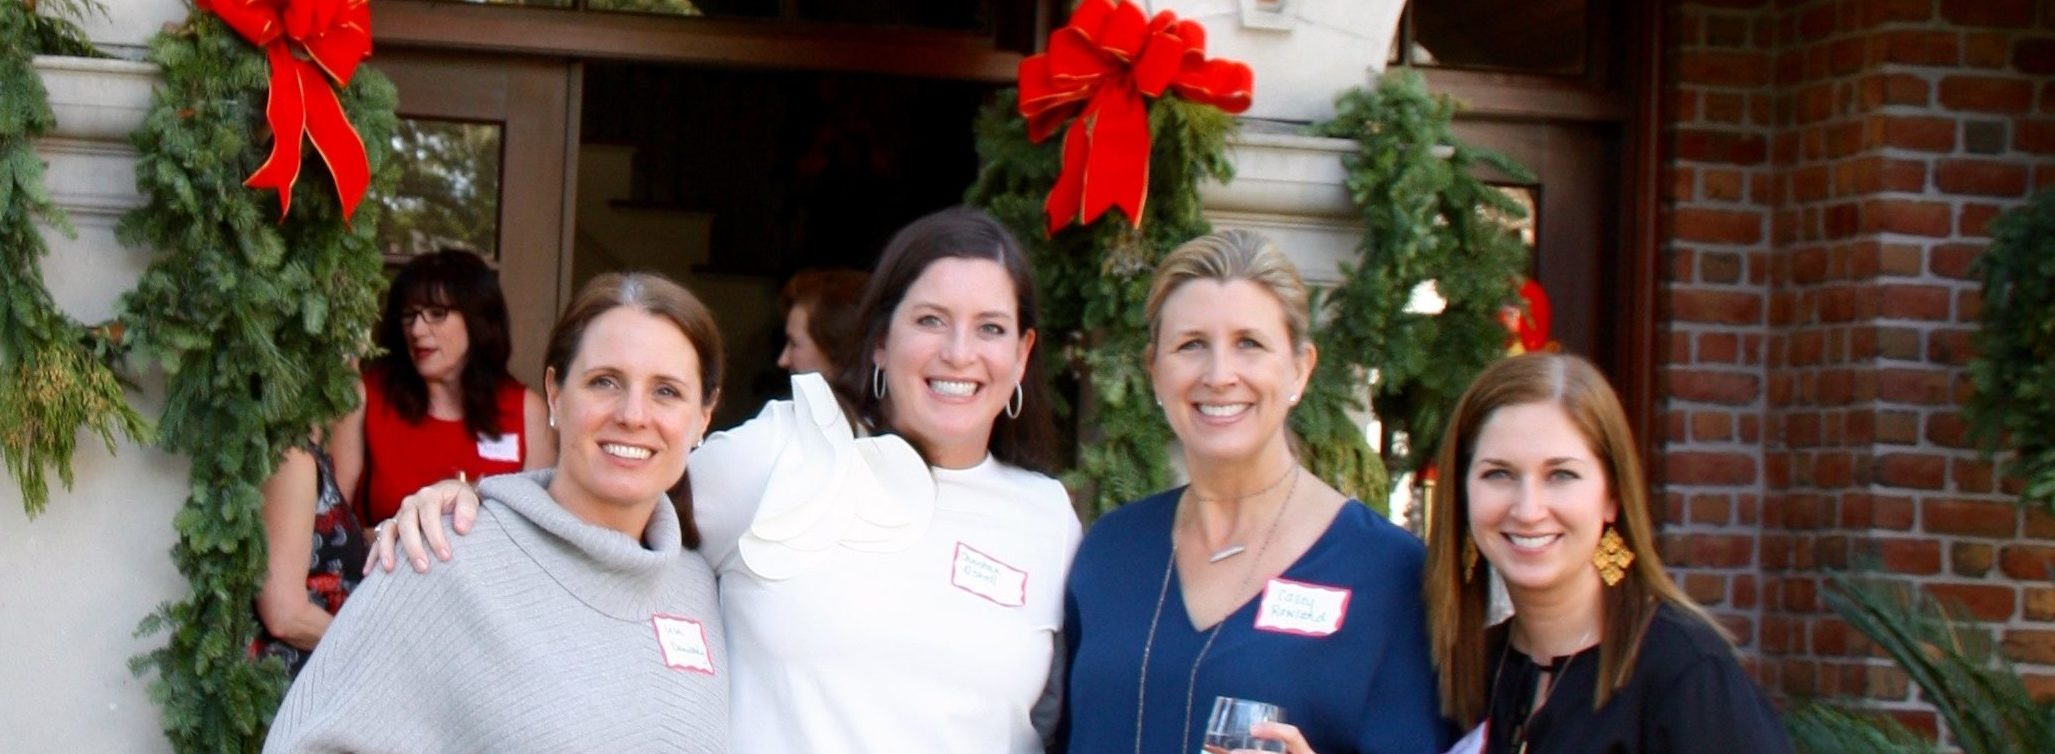 Recruitment Board Hosts Festive Christmas Lunch!